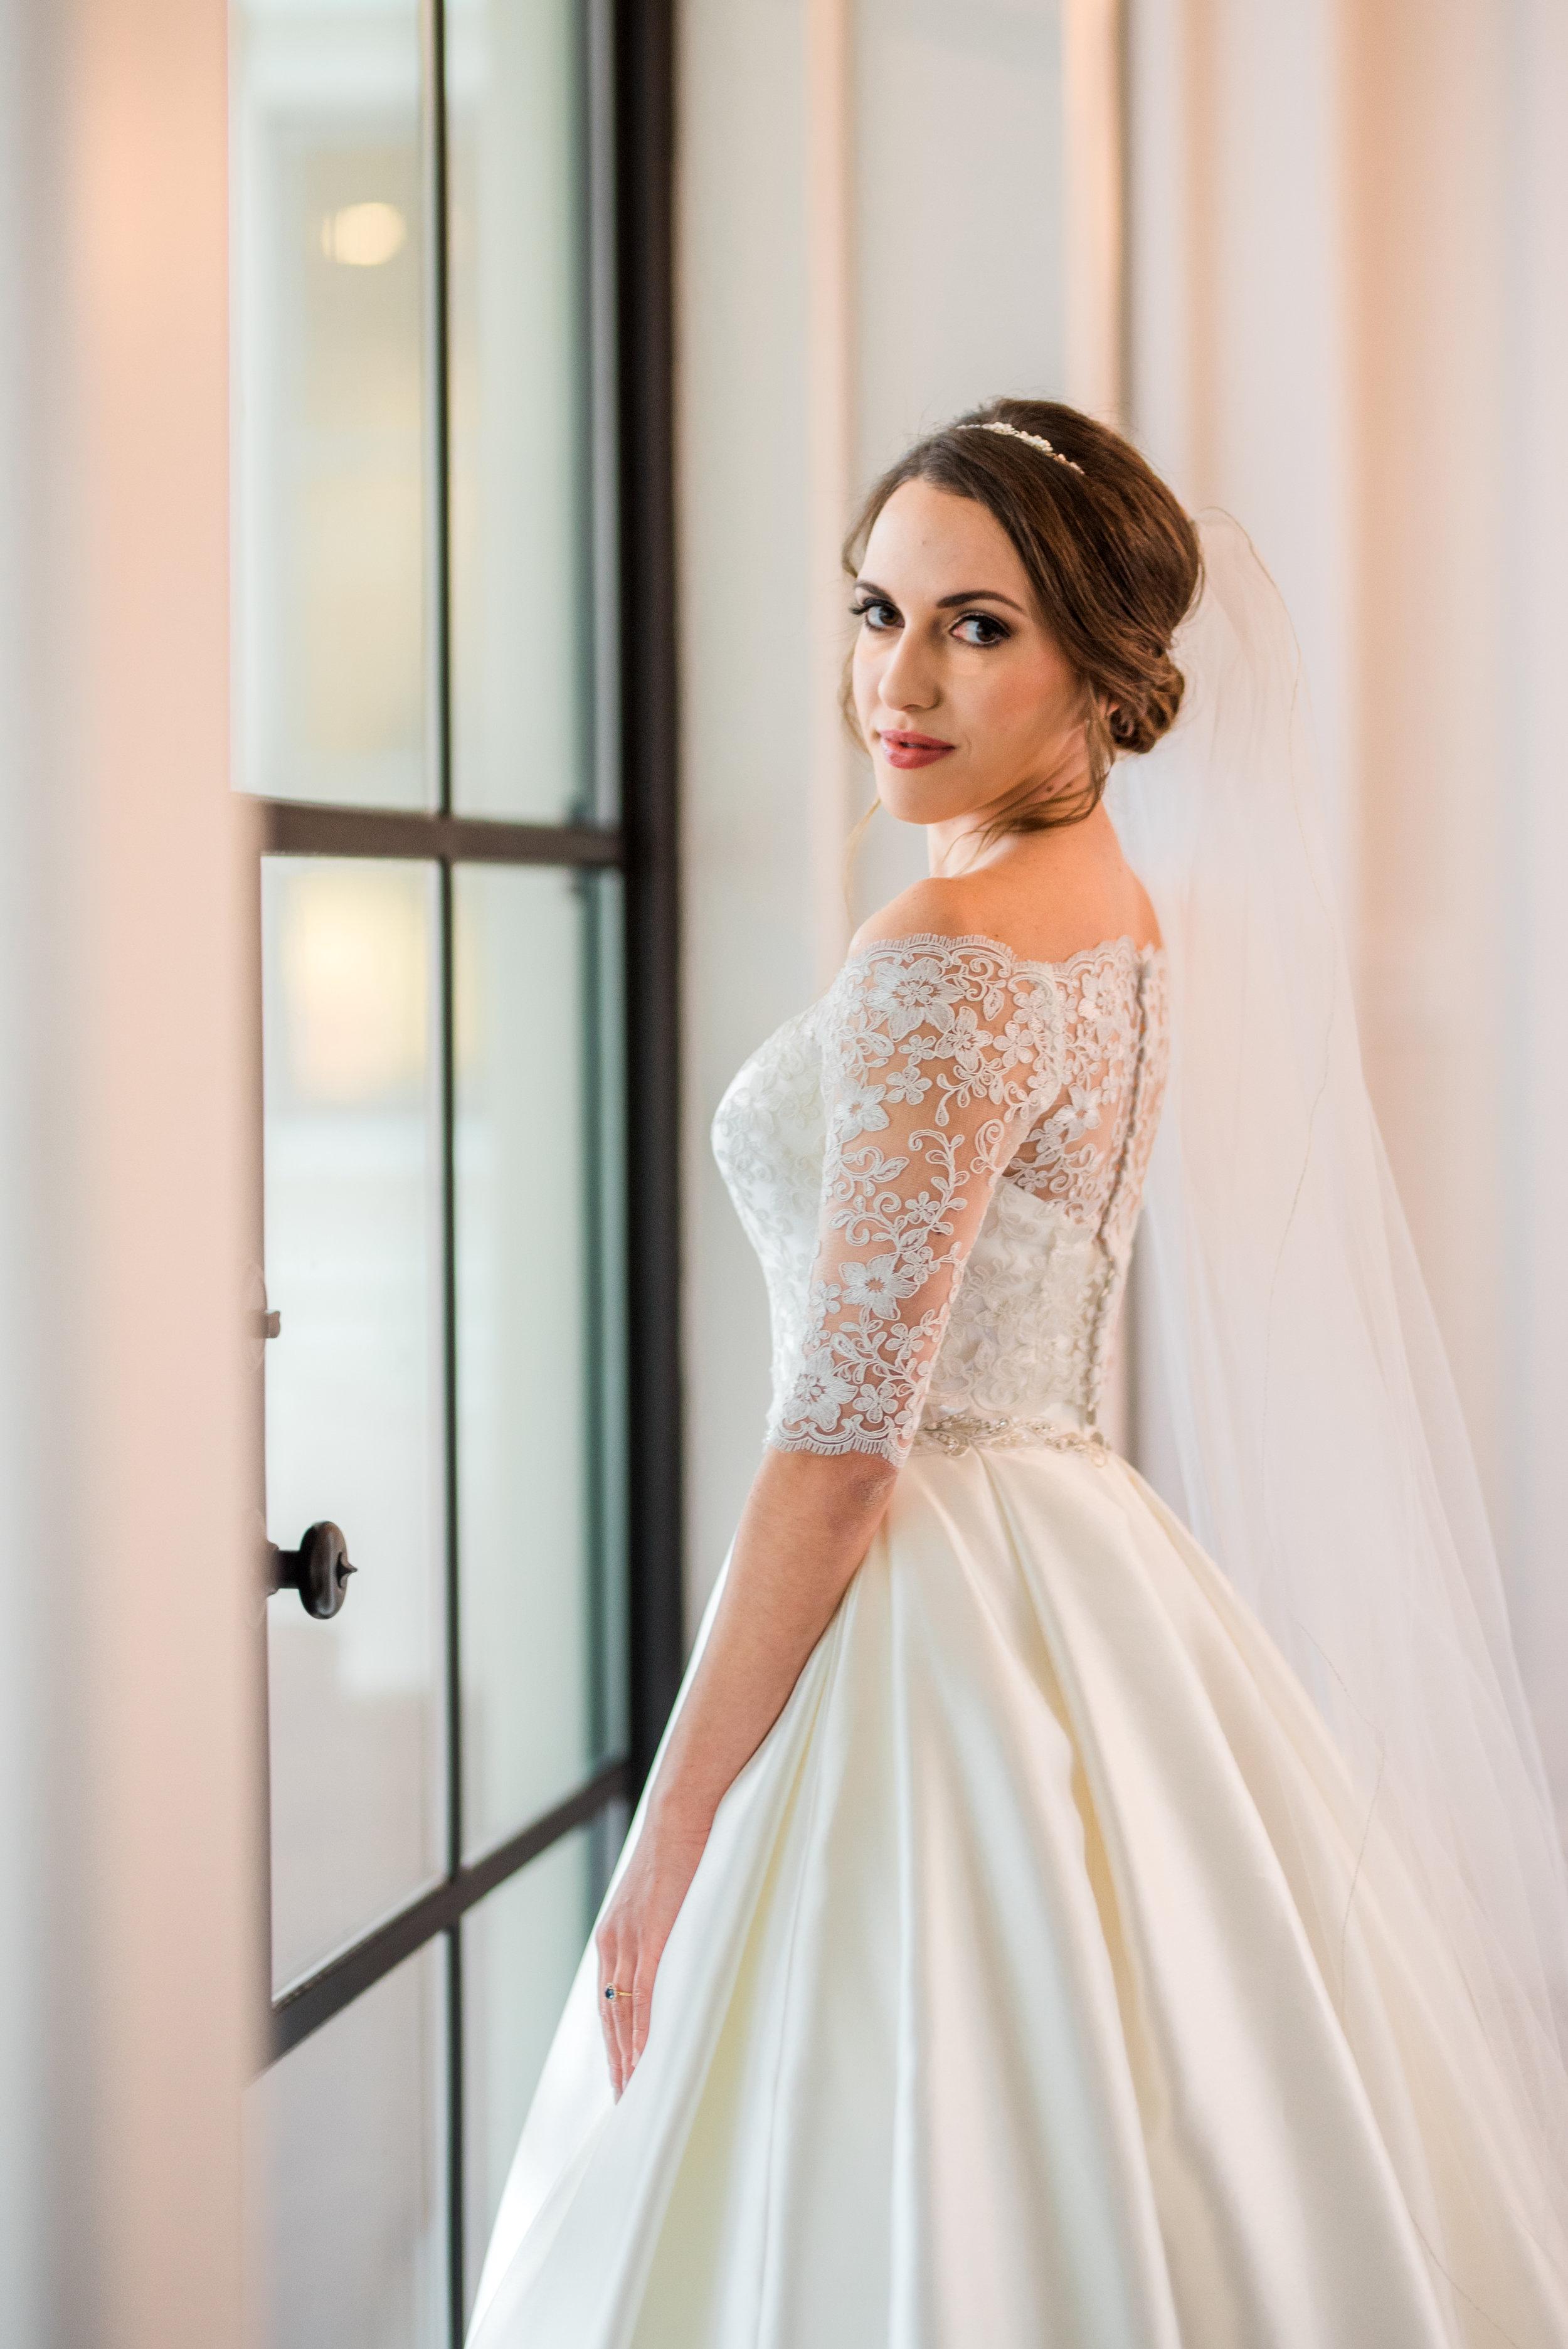 katy-wedding-photographer-houston-wedding-photographer-bride-sugar-land-cypress-richmond-spring-bridal-portraits-6.jpg